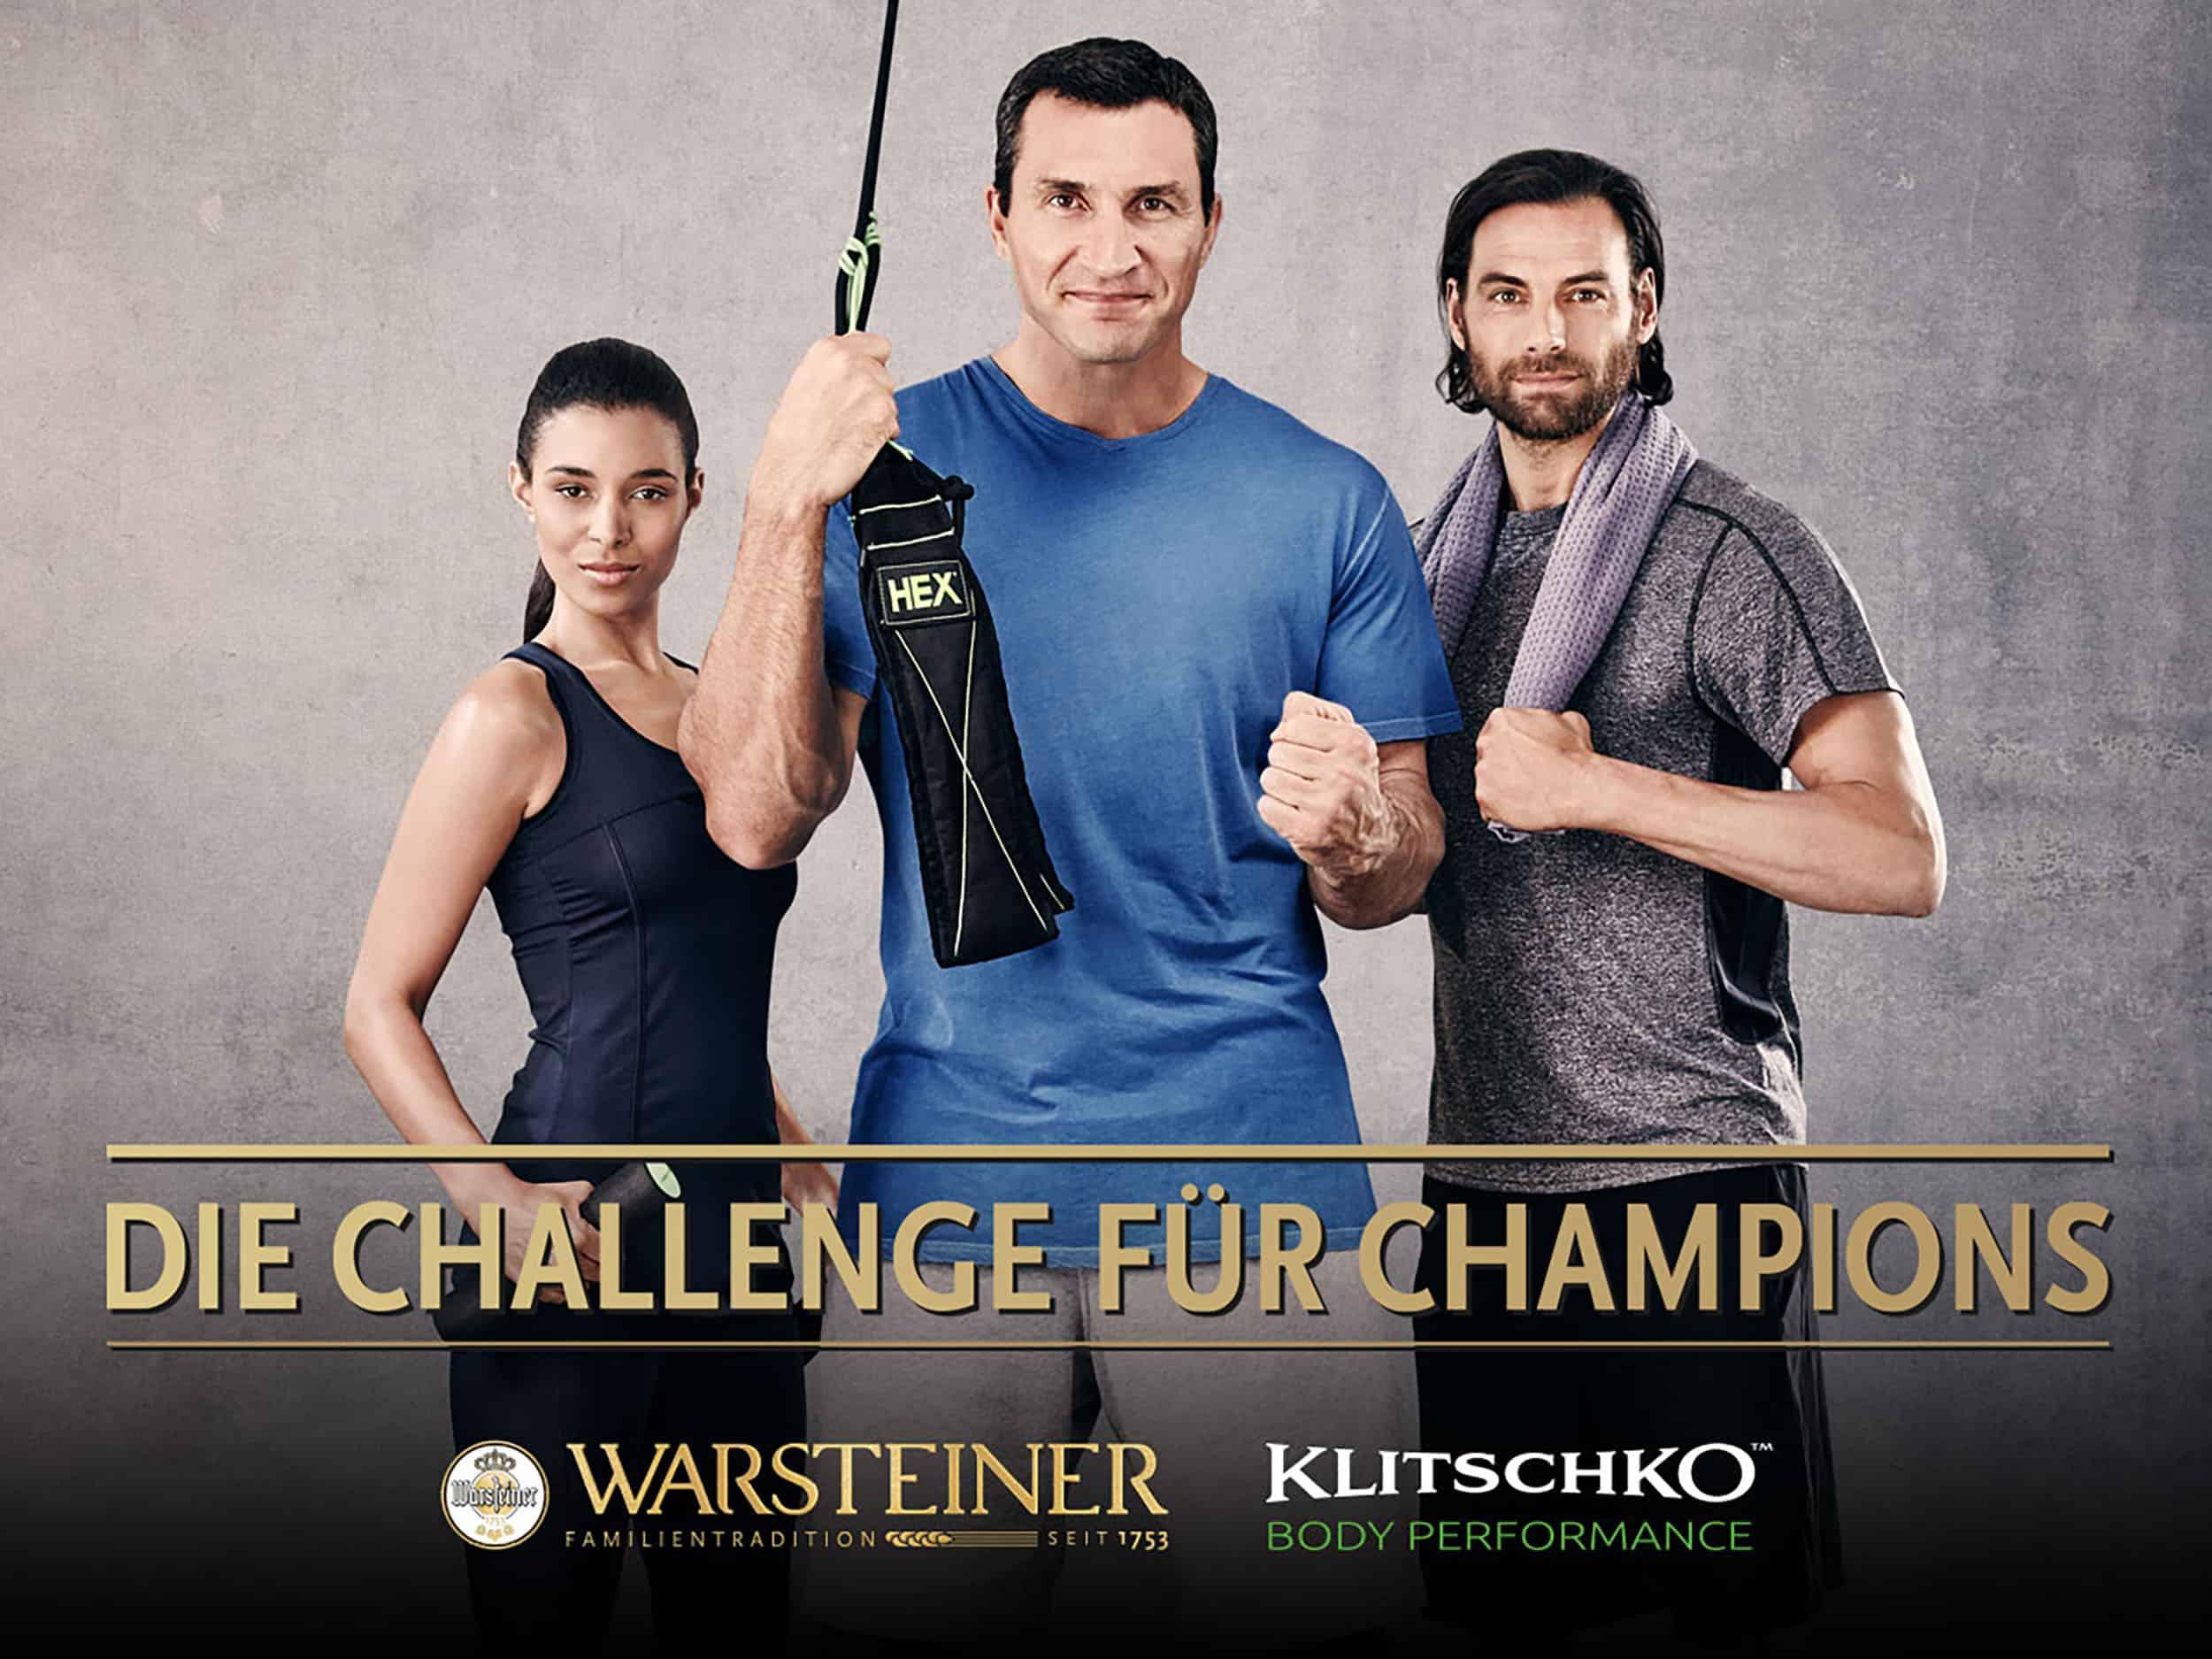 studio-ignatov-klitschko-warsteiner-imagekampagne-branding-04